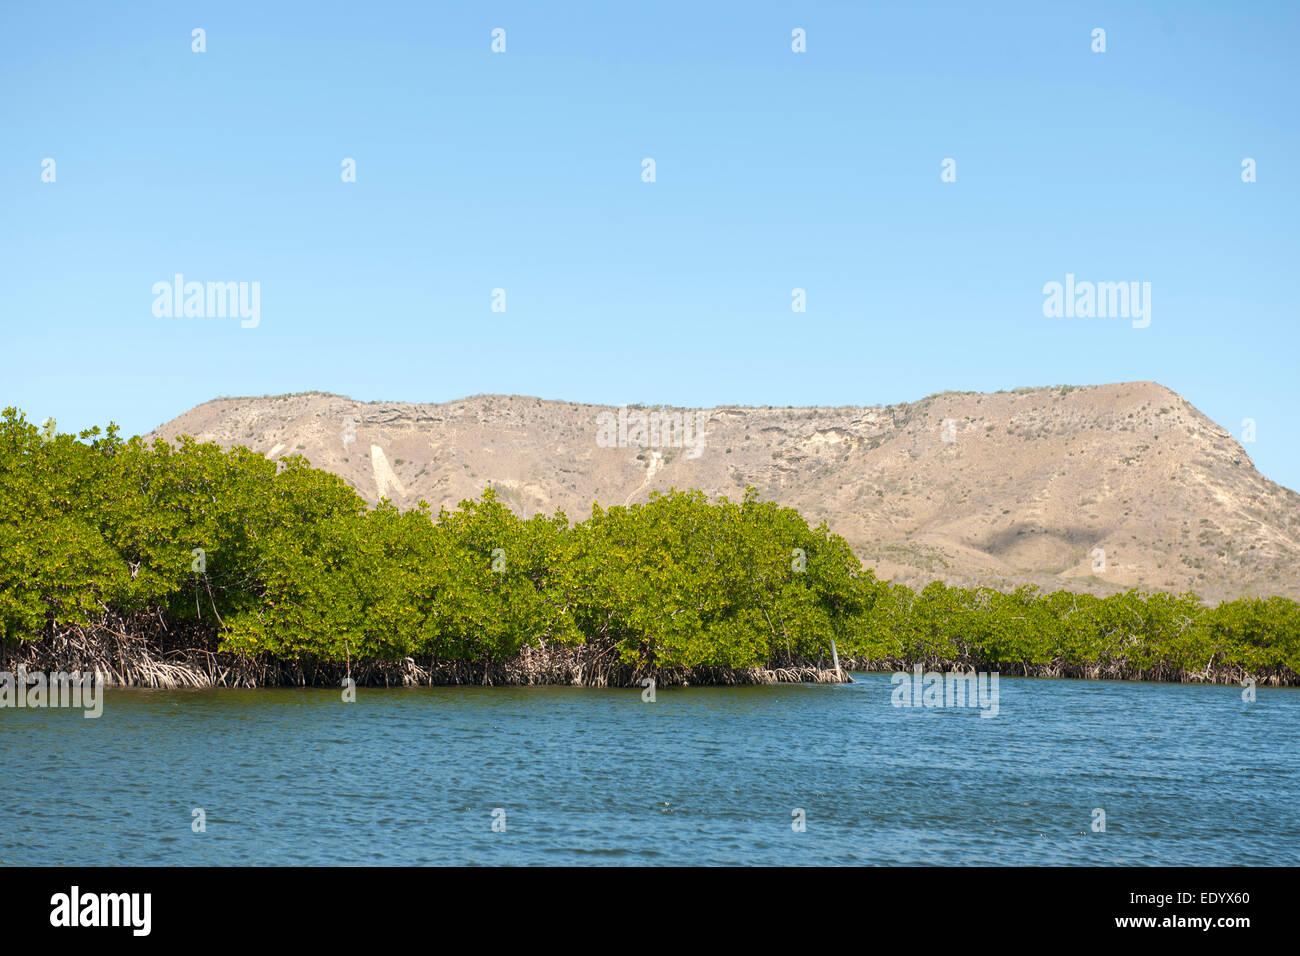 Dominikanische Republik, Nordküste, Monte Christi, im Nationalpark Monte Christi, Tafelberg El Morro - Stock Image